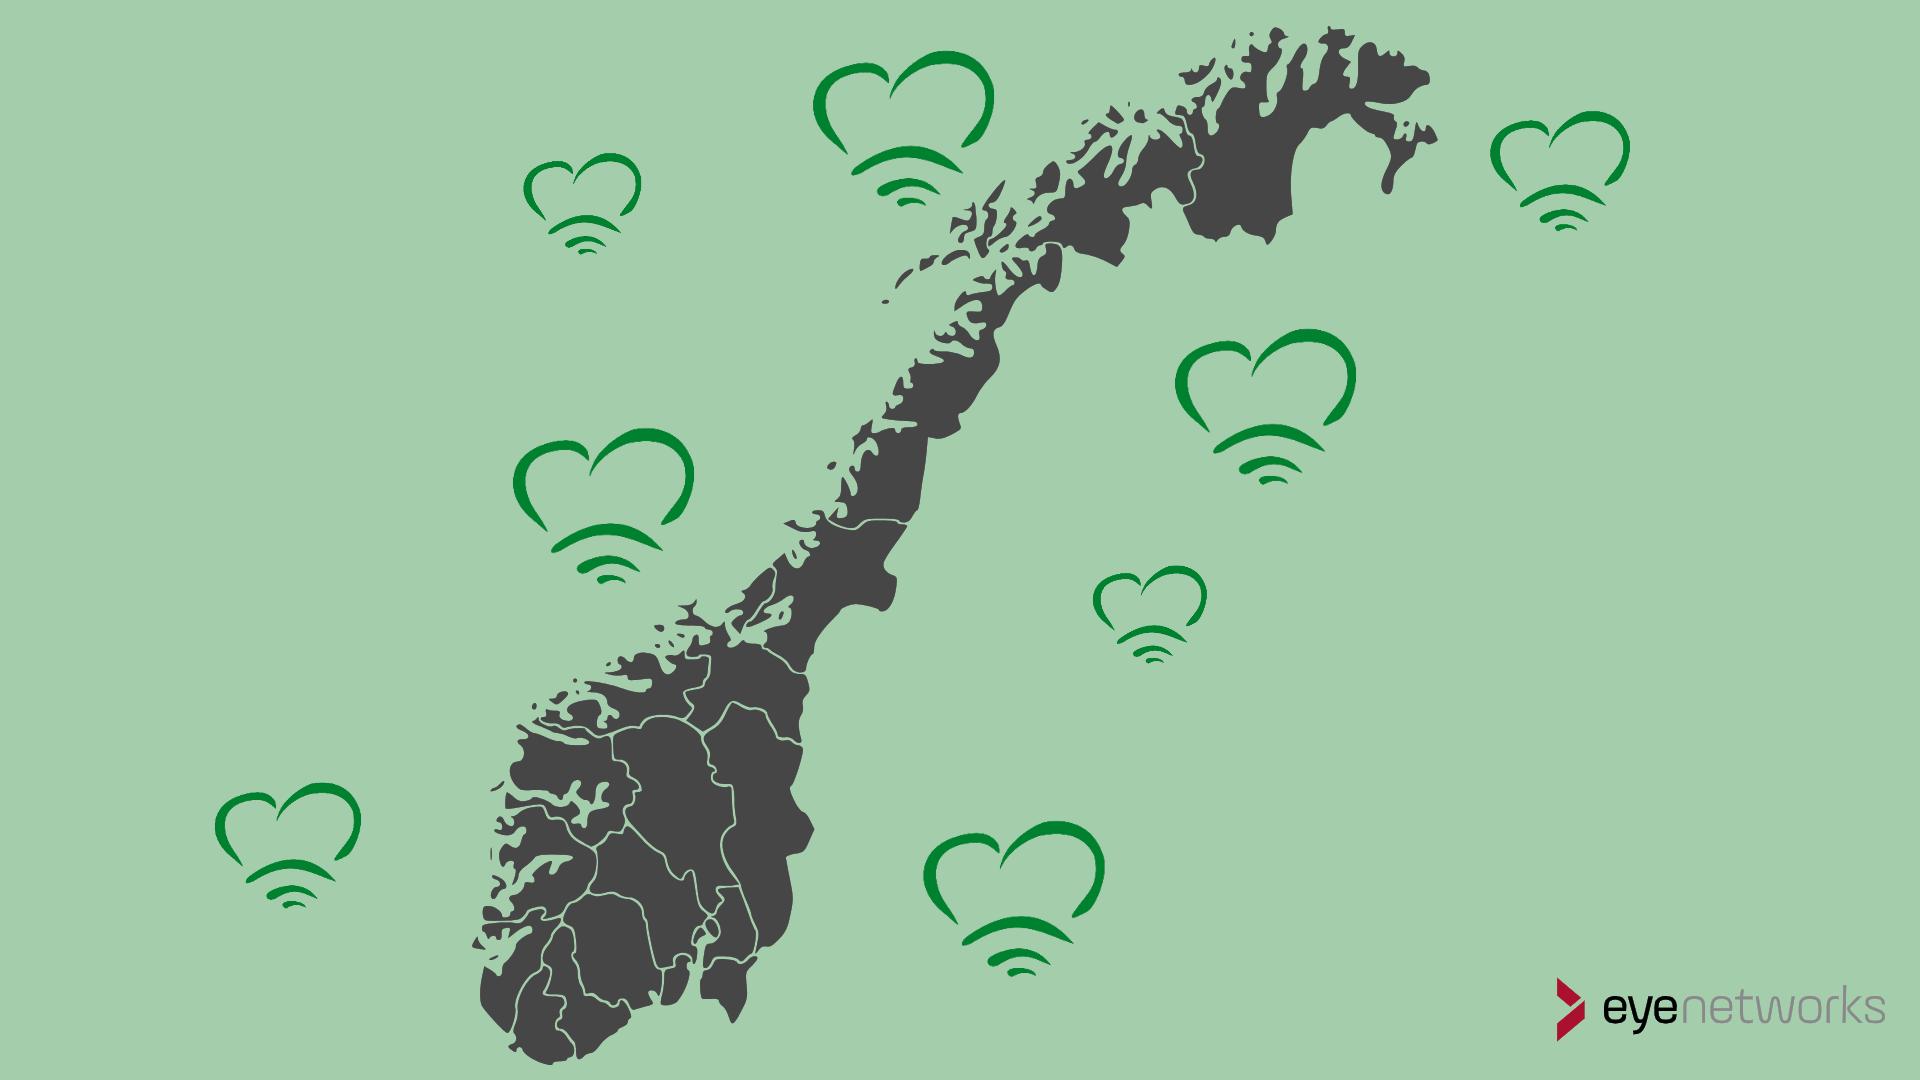 Eye Networks leverer mesh wifi til ISPer og andre forhandlere over hele Norge